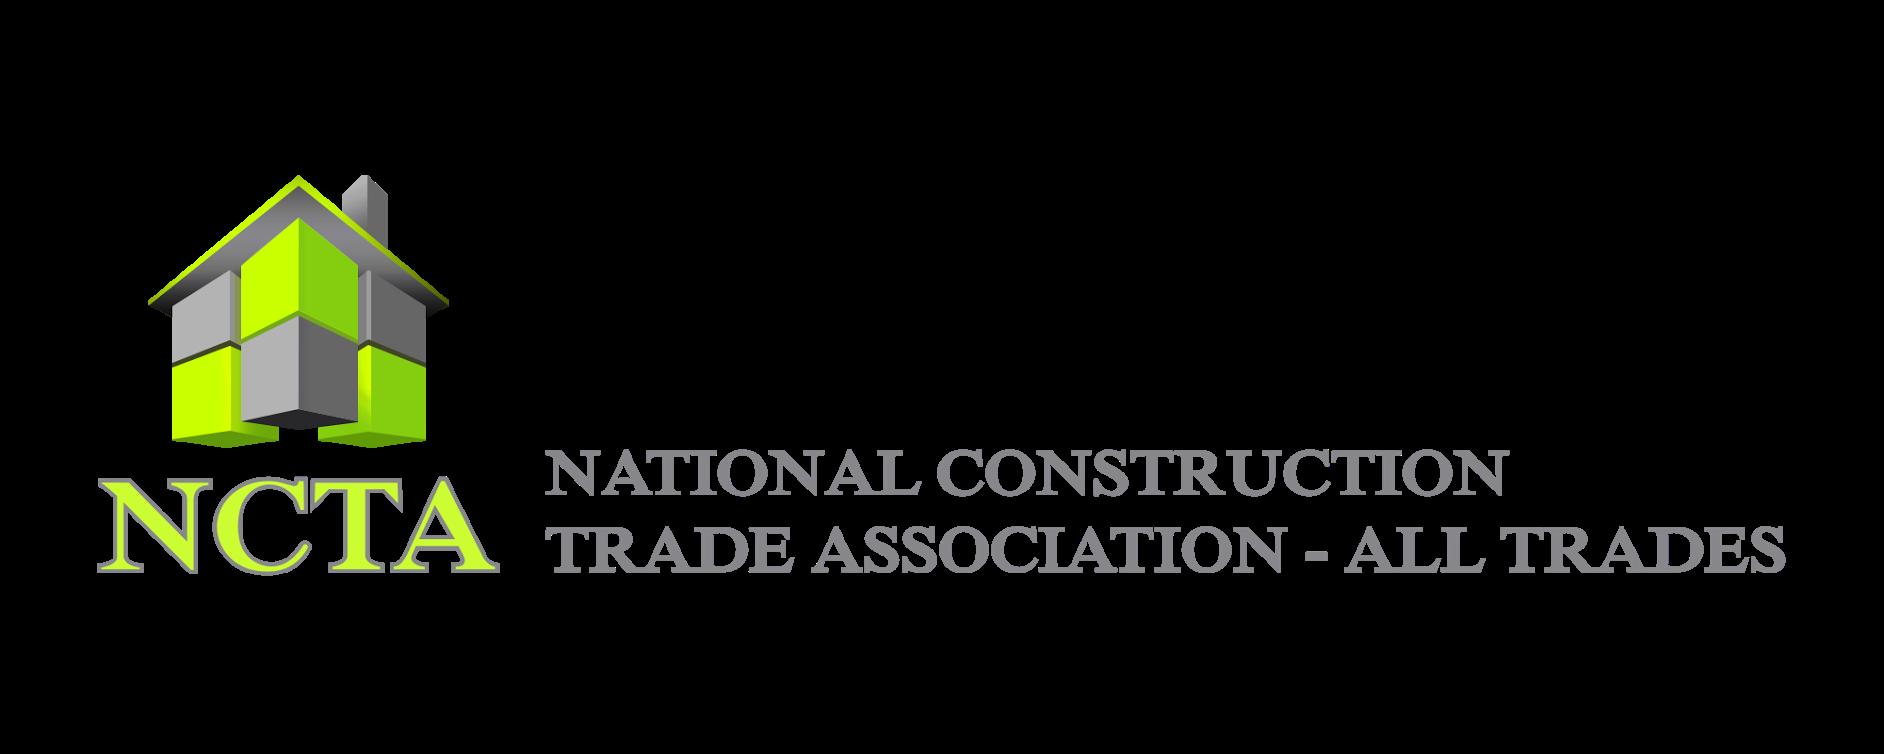 NCTA Website